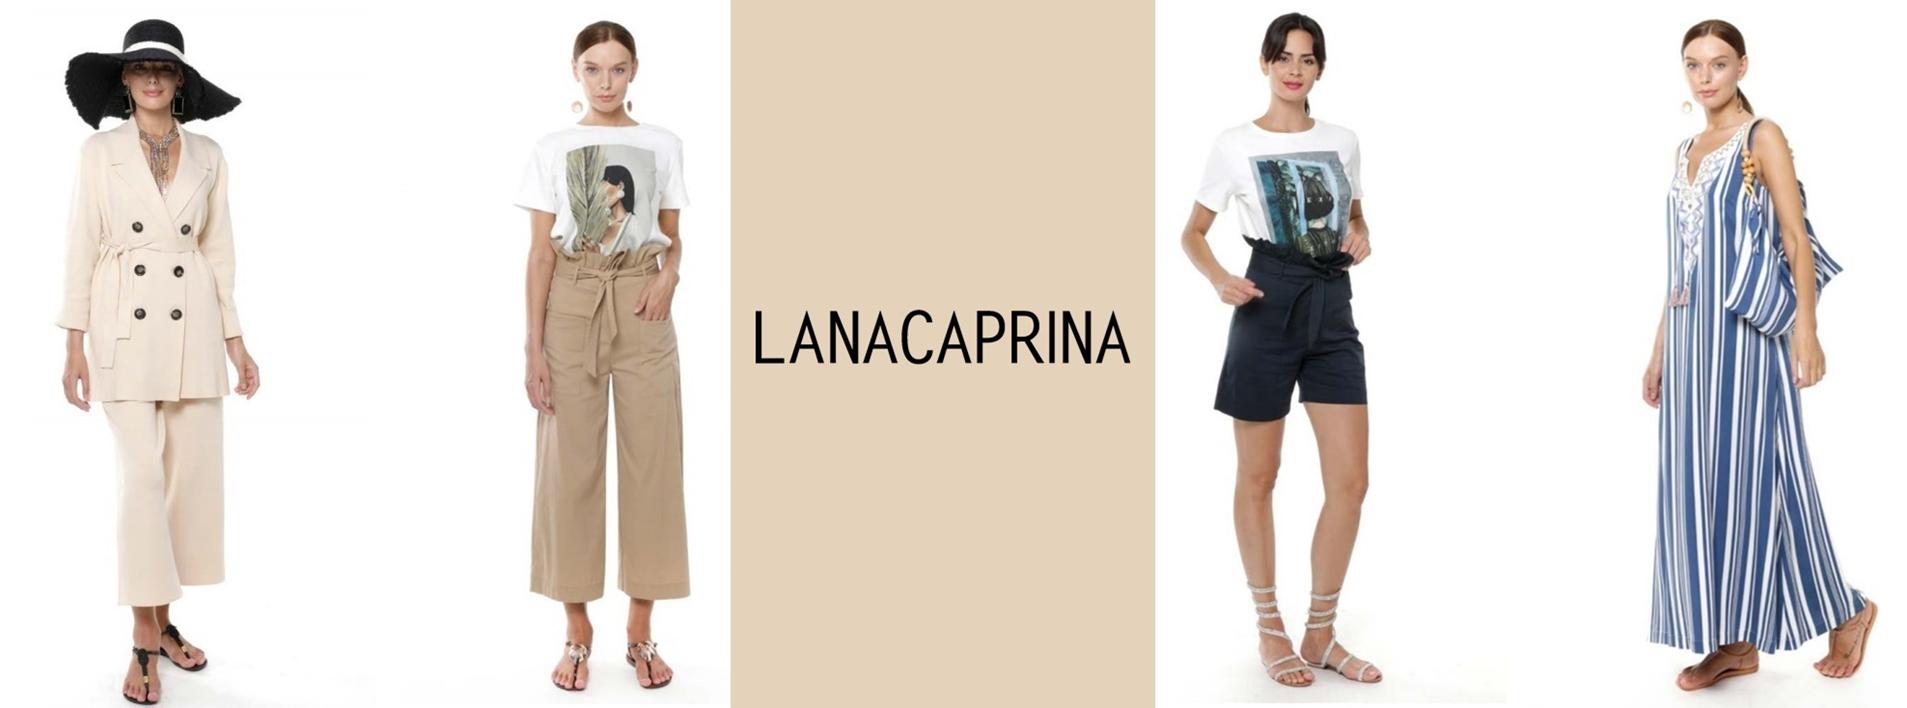 lanacaprina-banner-primavera-verano